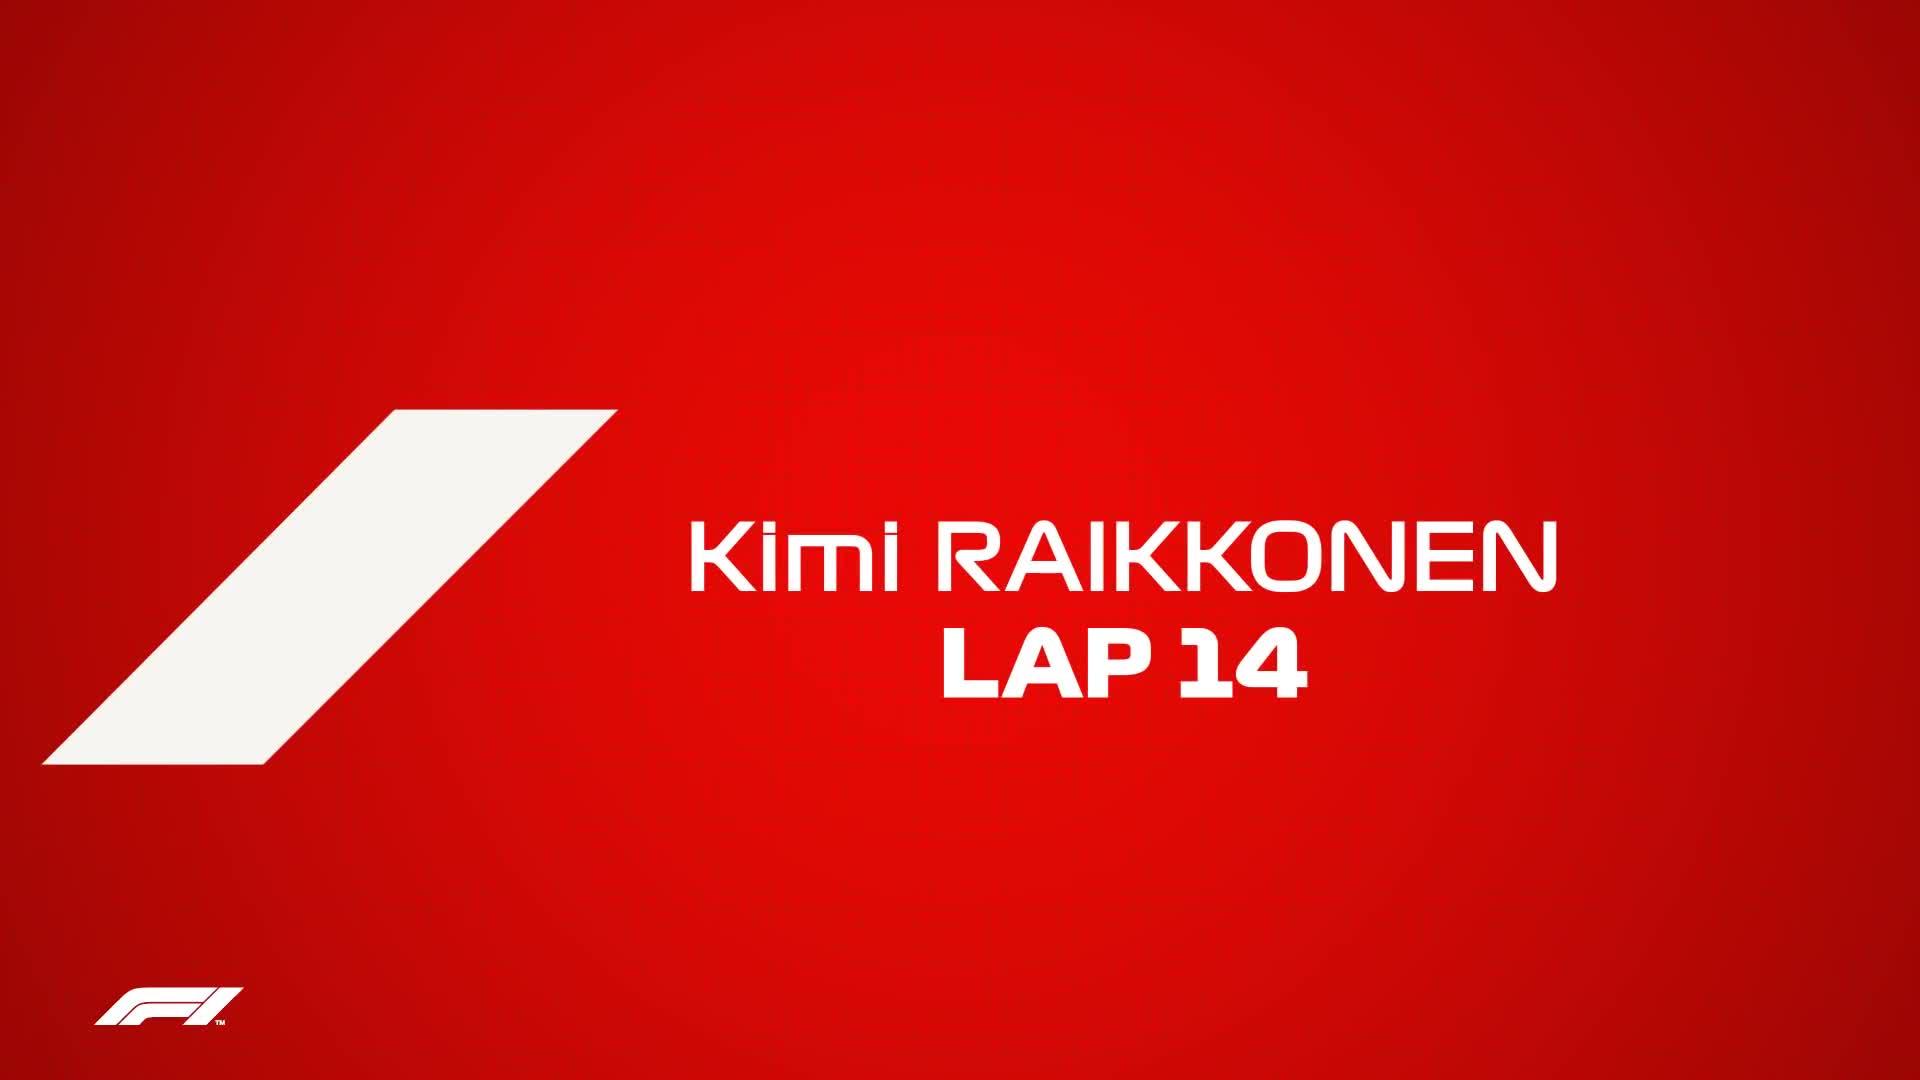 F1, Formula 1, Kimi